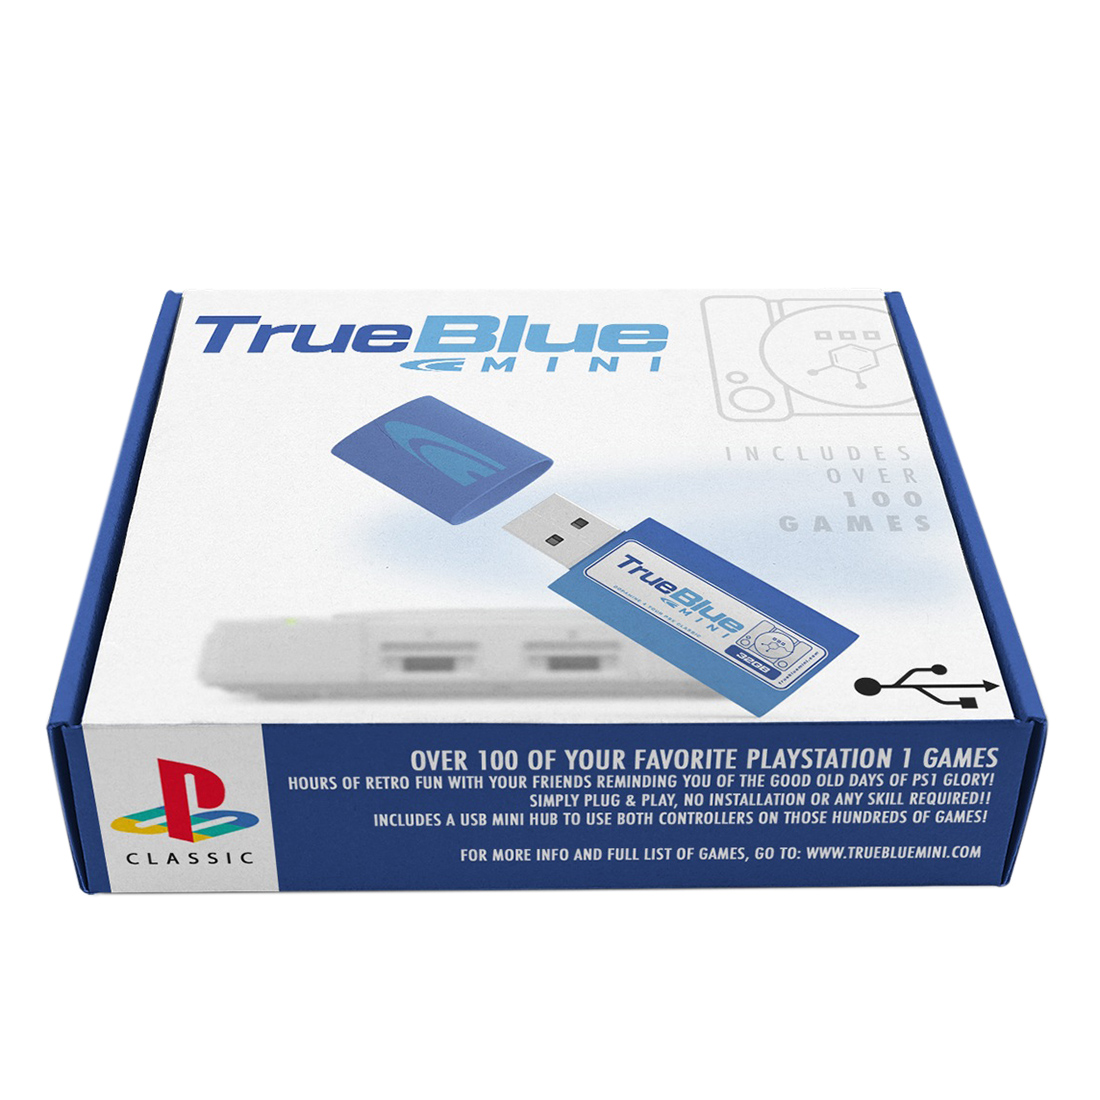 hobbyinrc-64gb-true-blue-mini-crackhead-pack-for-font-b-playstation-b-font-classic-games-accessories-101-games-v1